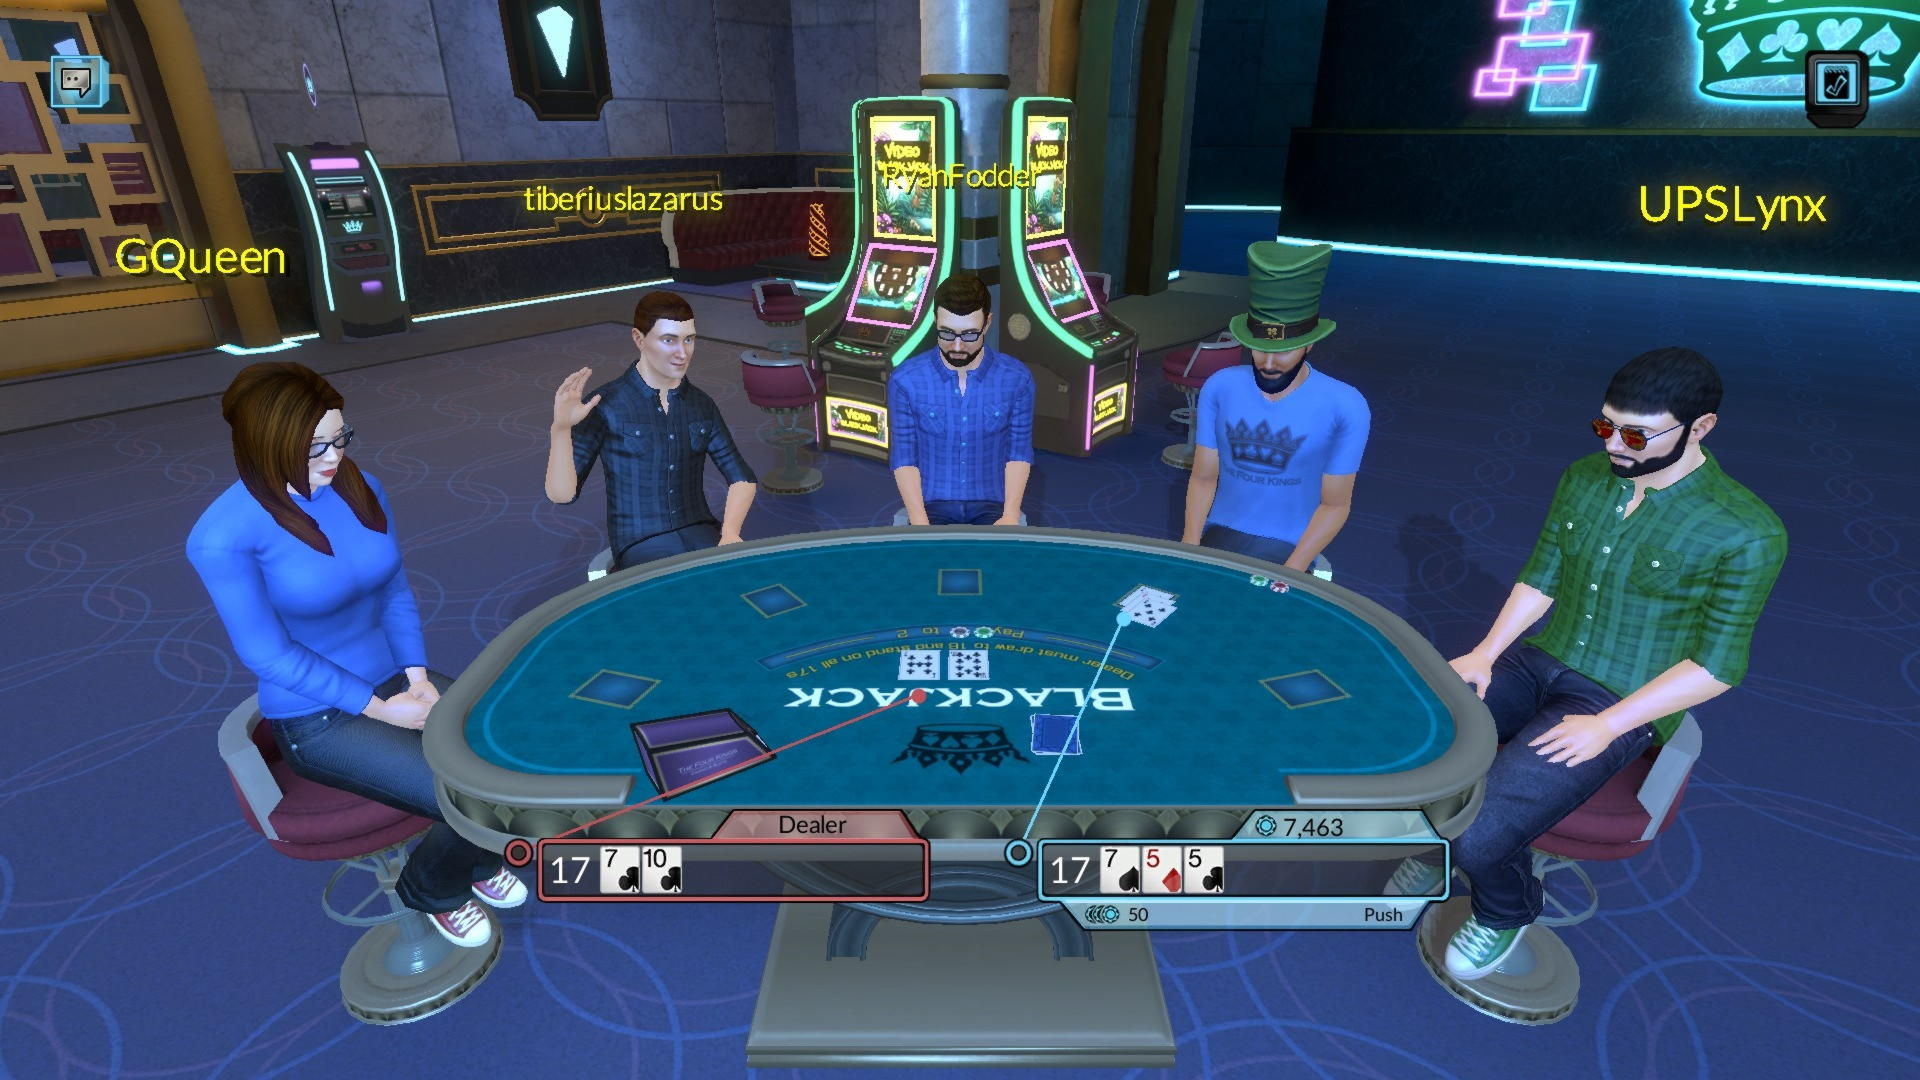 €40 Mobile freeroll slot tournament at Europa Casino